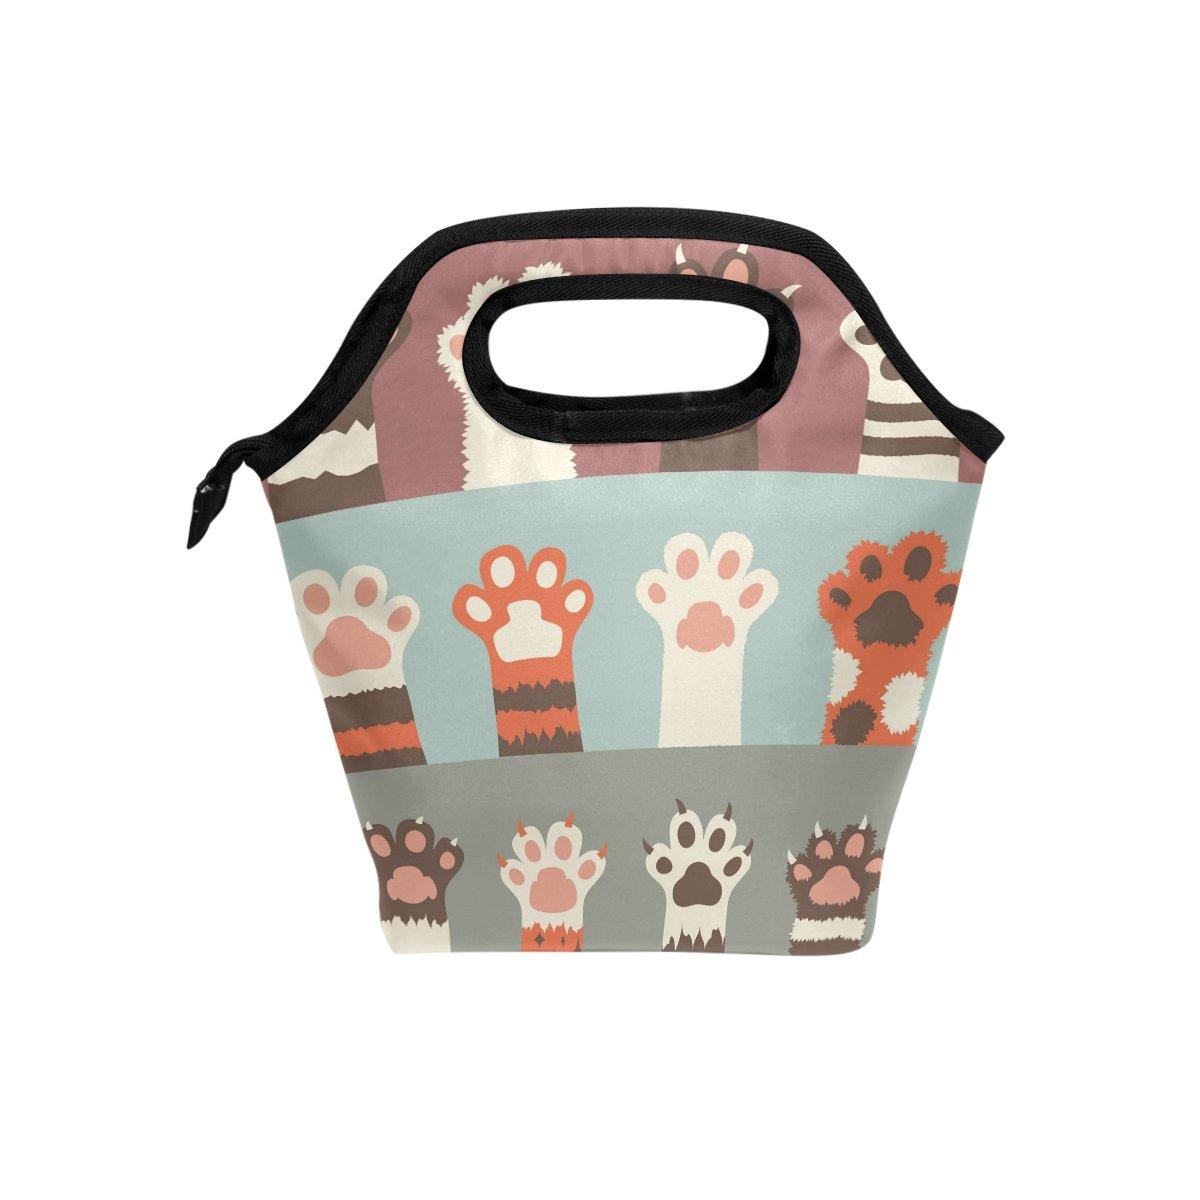 JOYPRINT Lunch Box Bag, Cartoon Animal Cat Paw Print Insulated Cooler Ice Lunchbox Tote Bag Handbag for Men Women Kids Adult Boys Girls